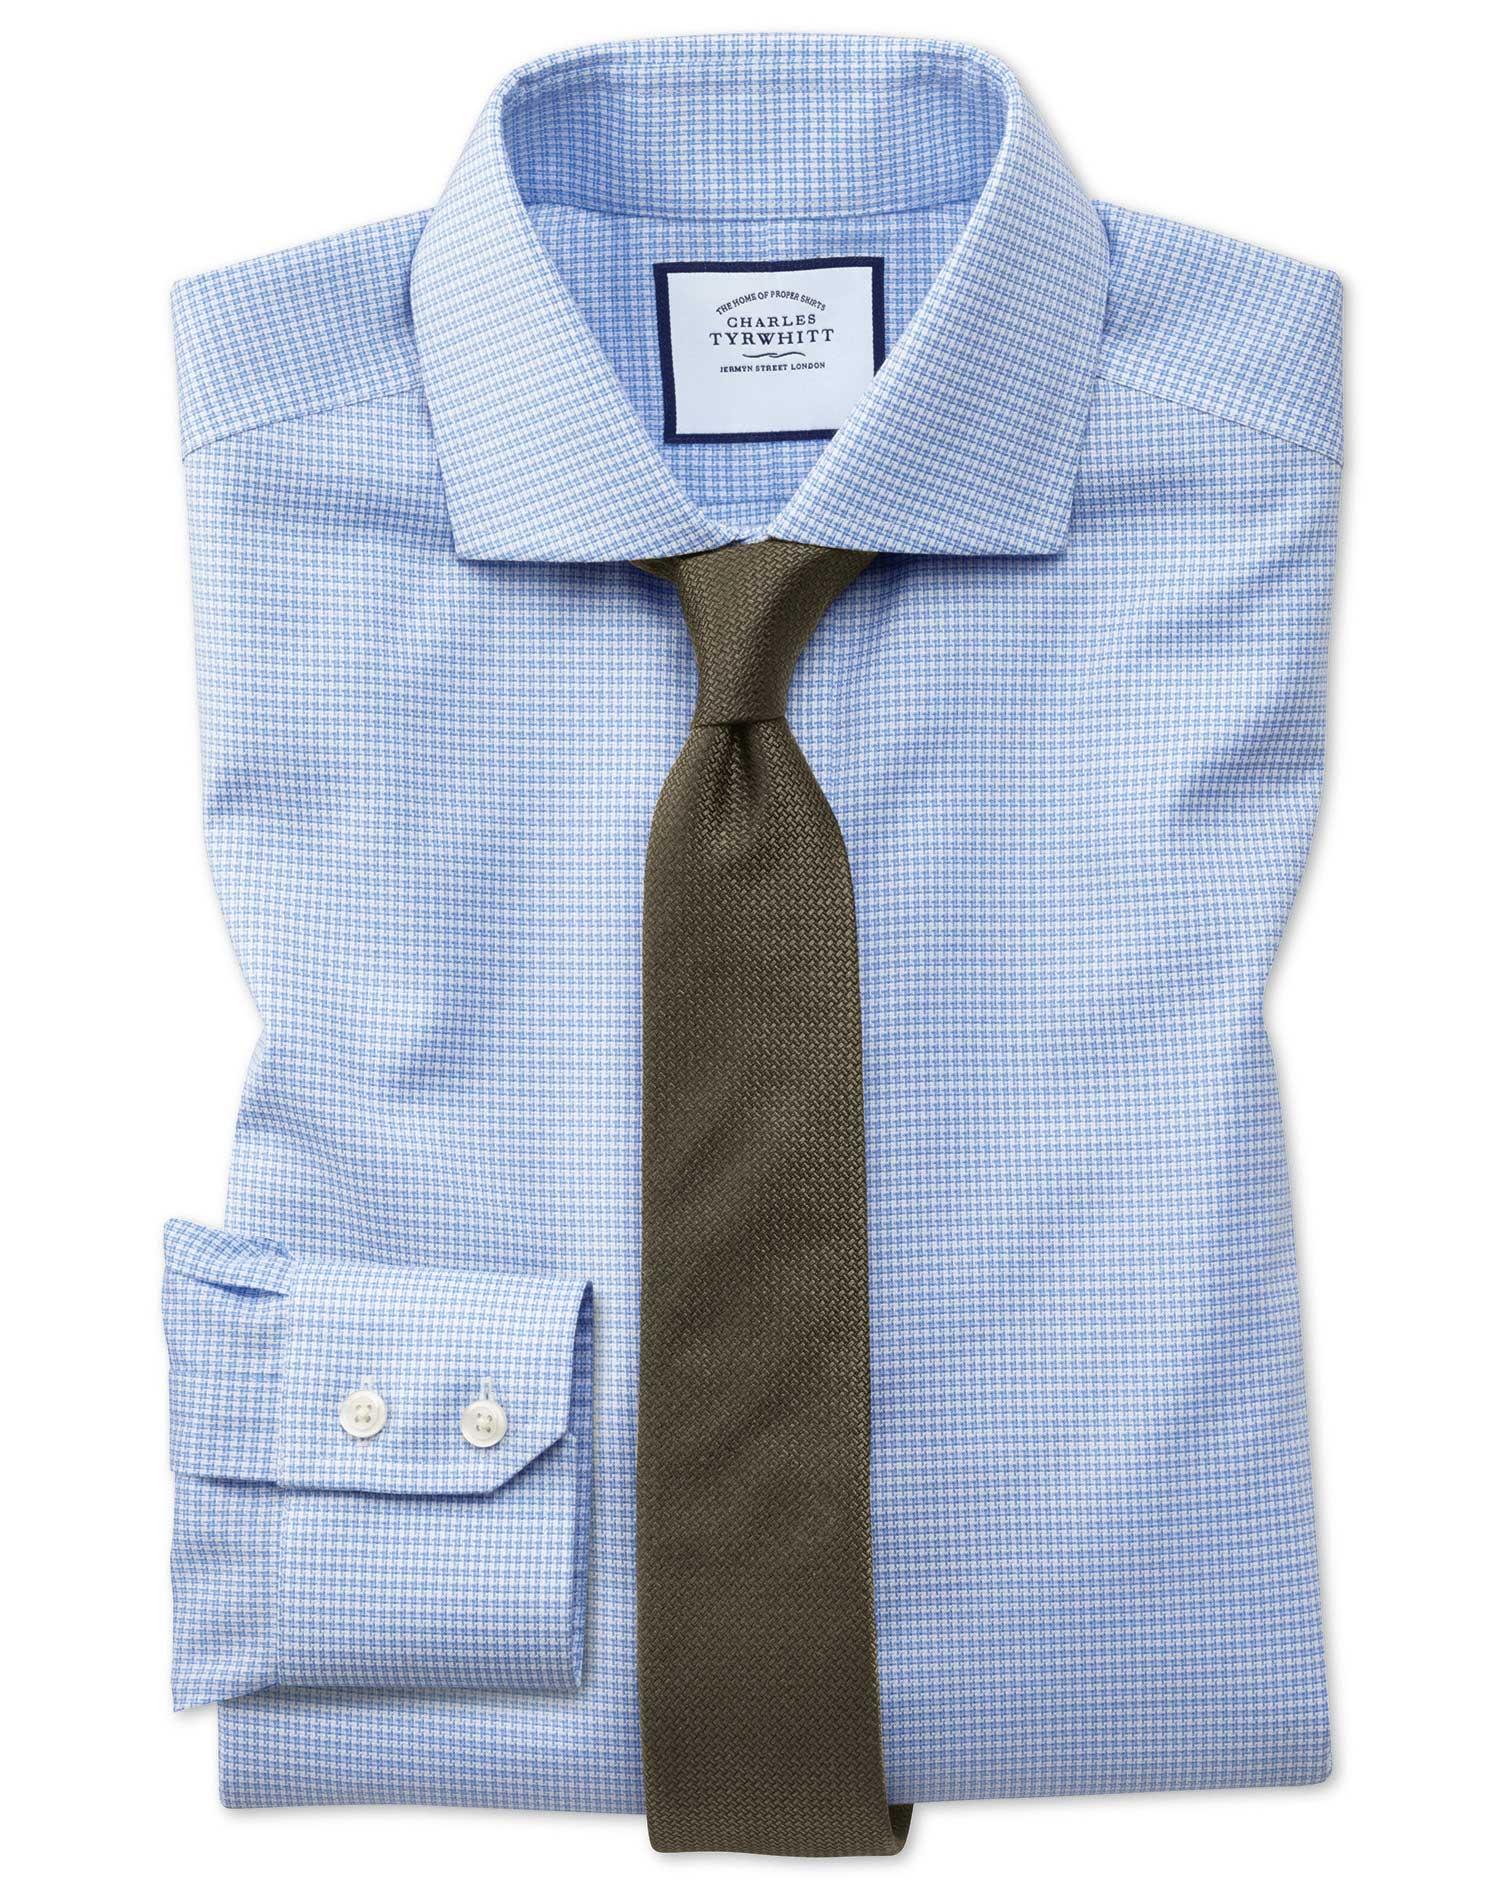 Slim Fit Non-Iron Cutaway Collar Sky Blue Puppytooth Oxford Stretch Cotton Formal Shirt Single Cuff